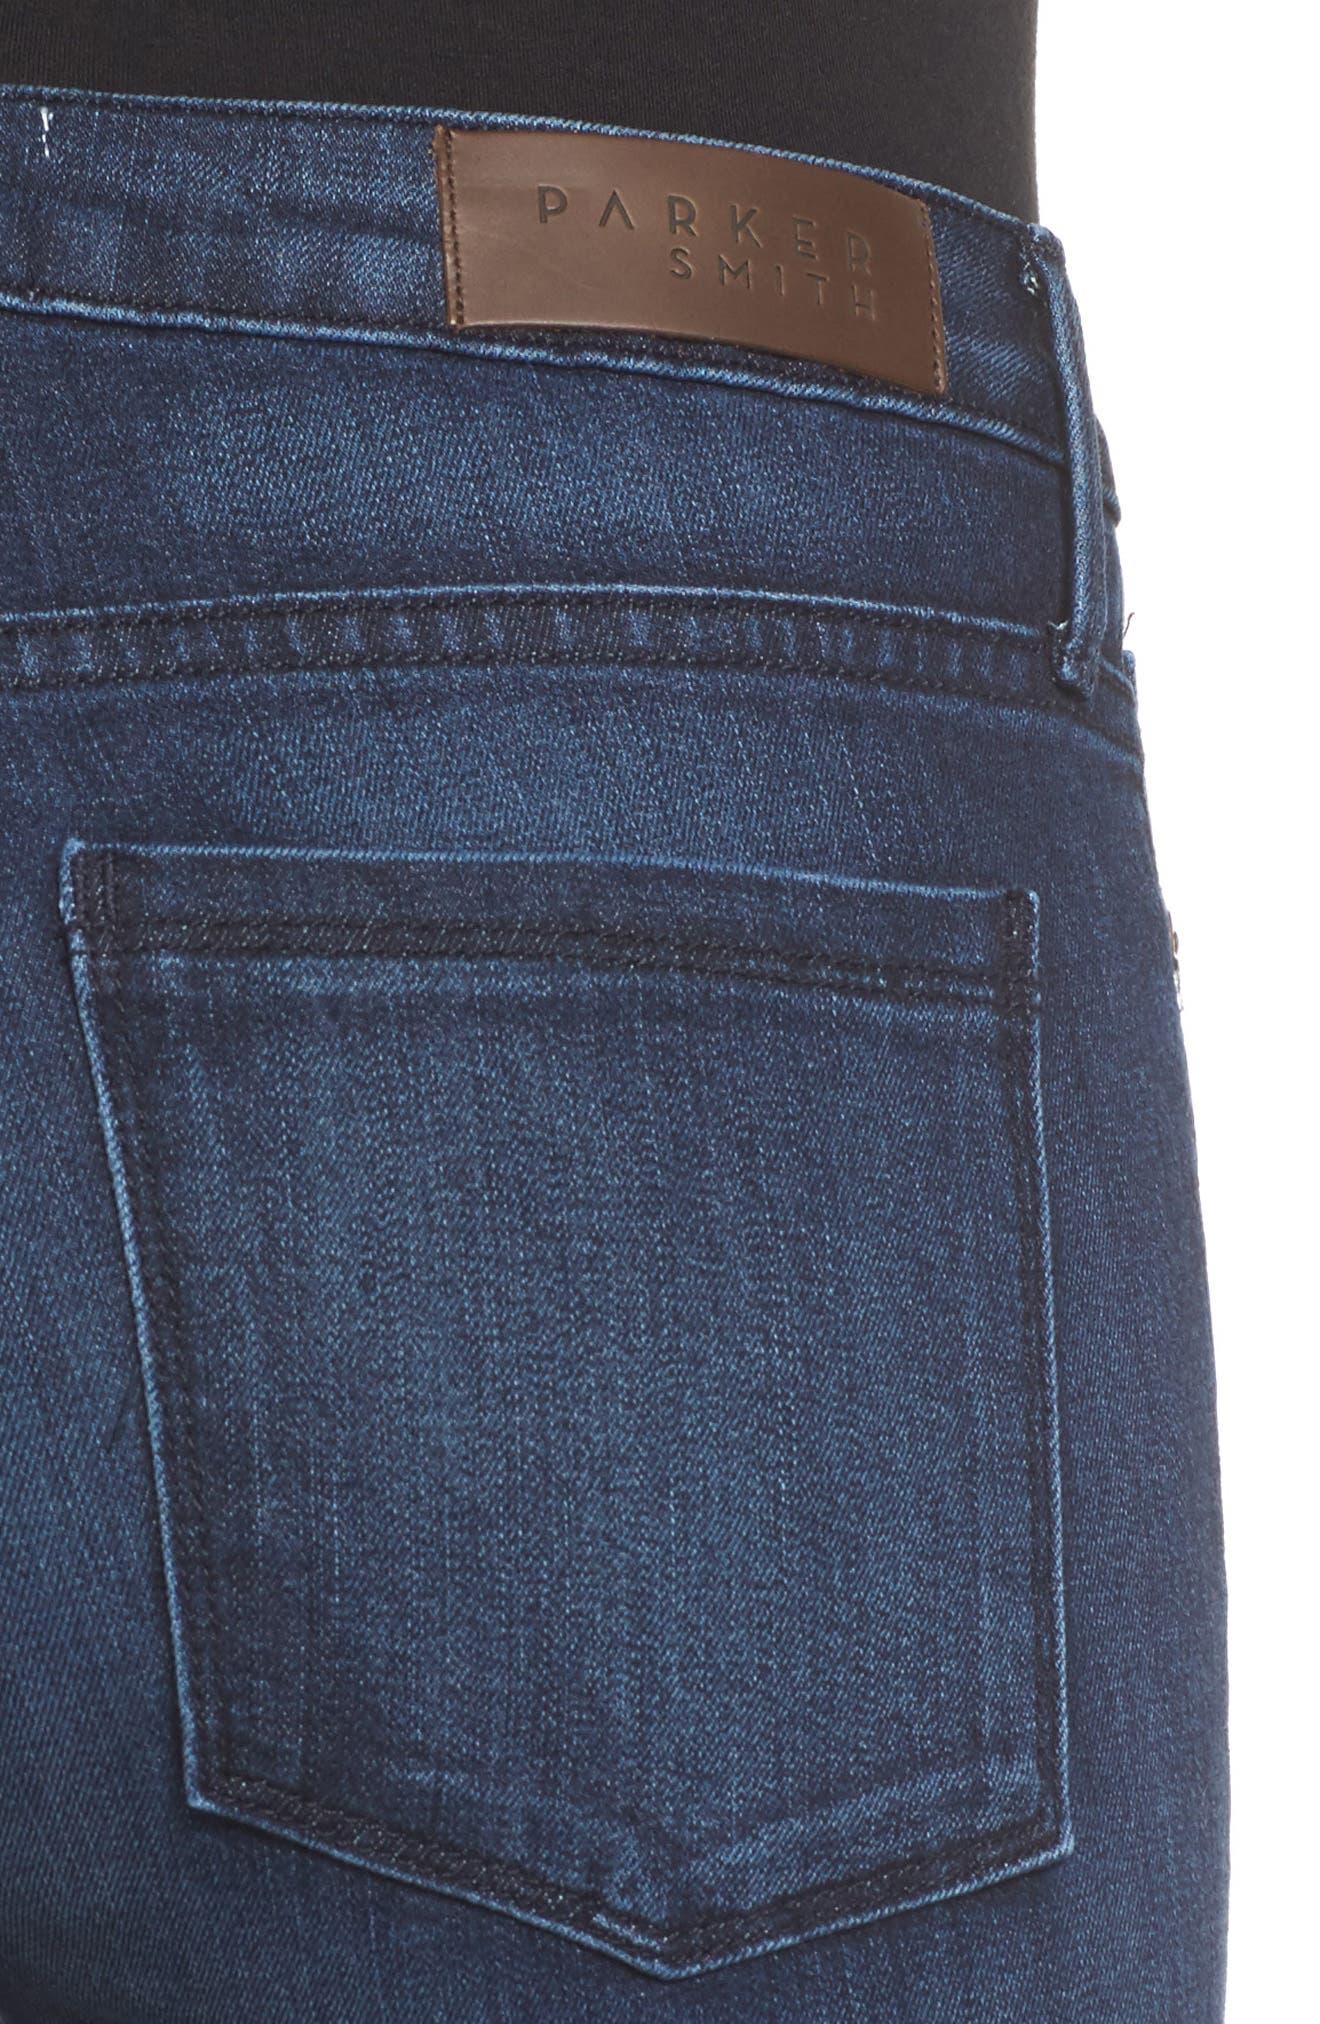 Bombshell High Waist Stretch Skinny Jeans,                             Alternate thumbnail 12, color,